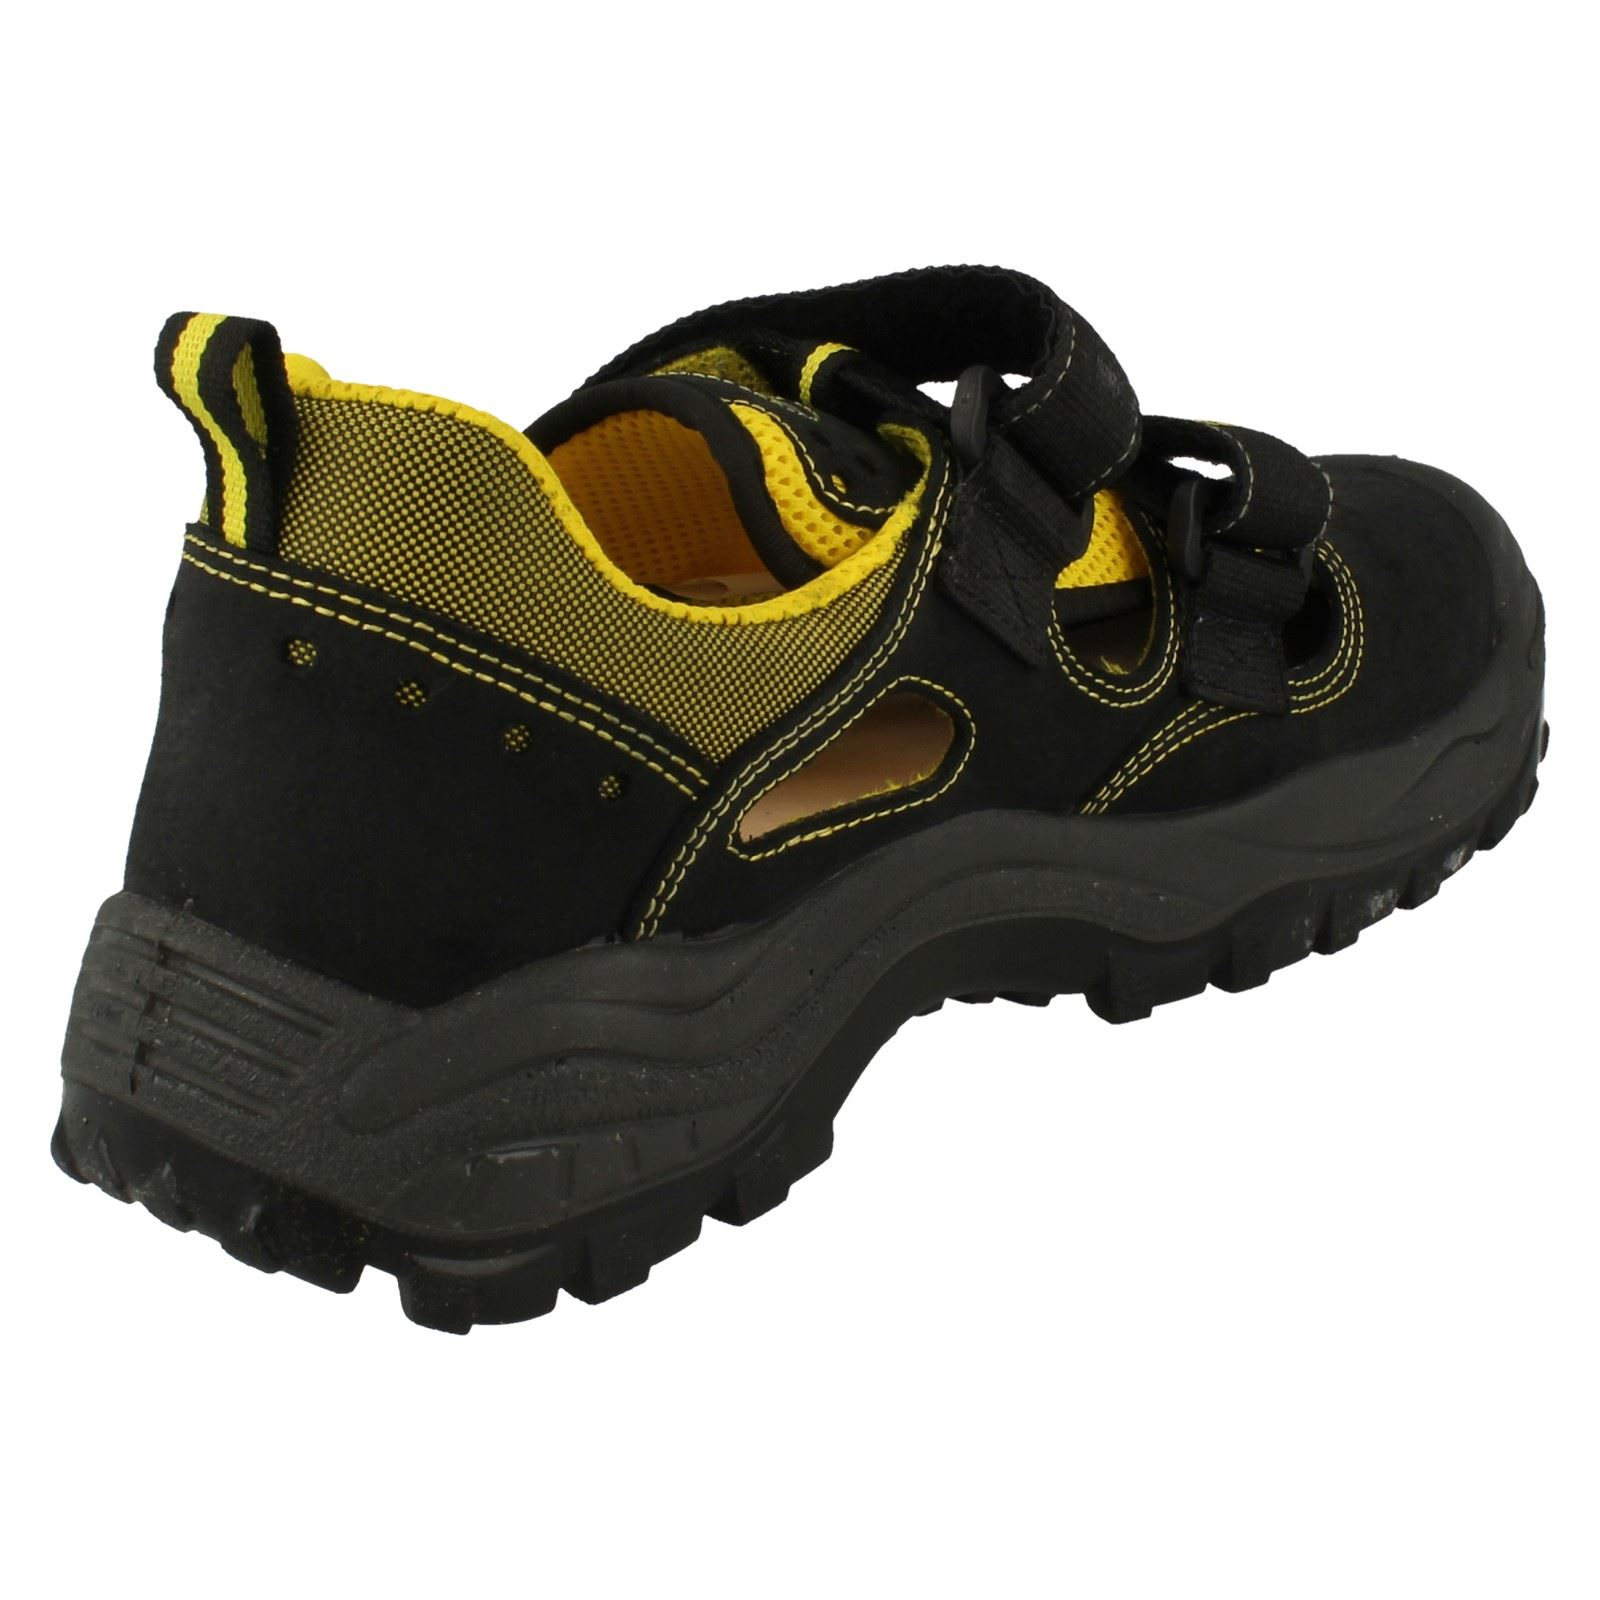 Mens Panther Steel Toe Cap Safety Sandals - Dune | eBay